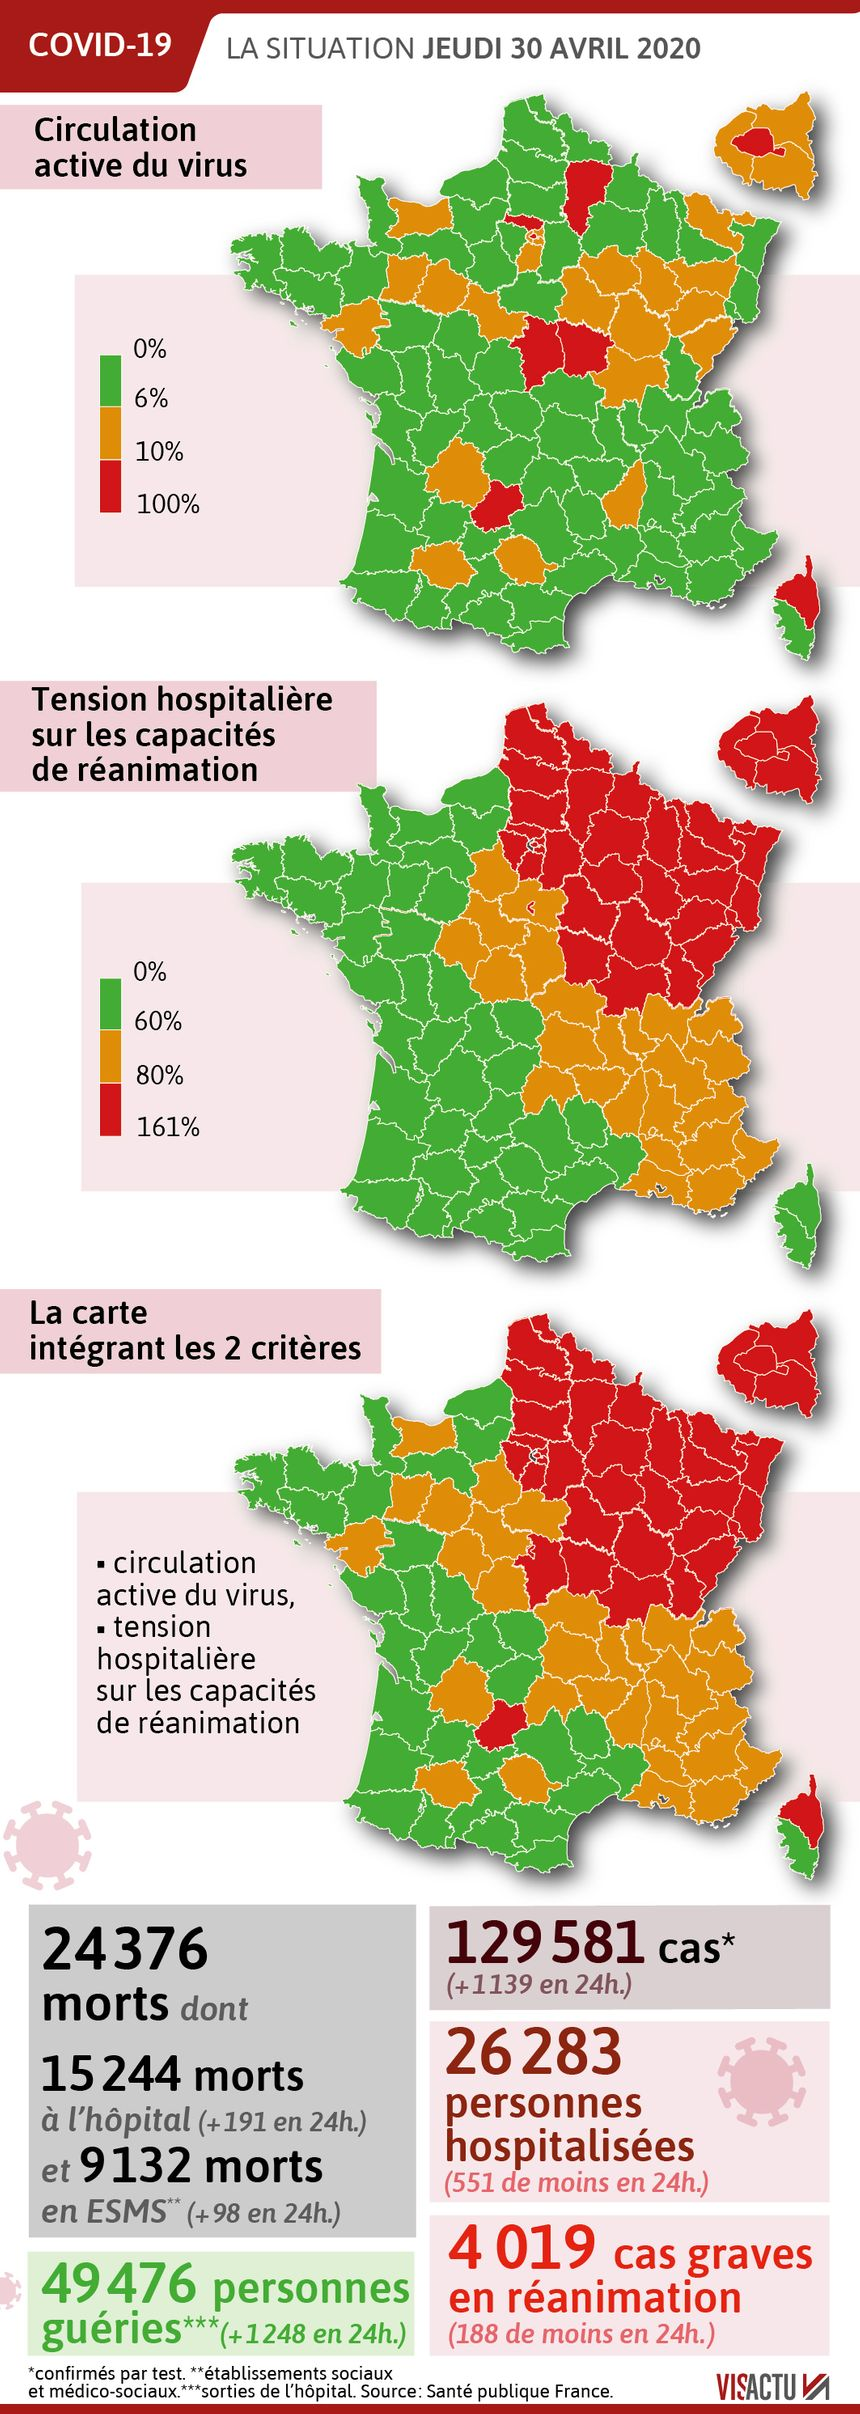 Coronavirus : cartes et chiffres en France, jeudi 30 avril 2020